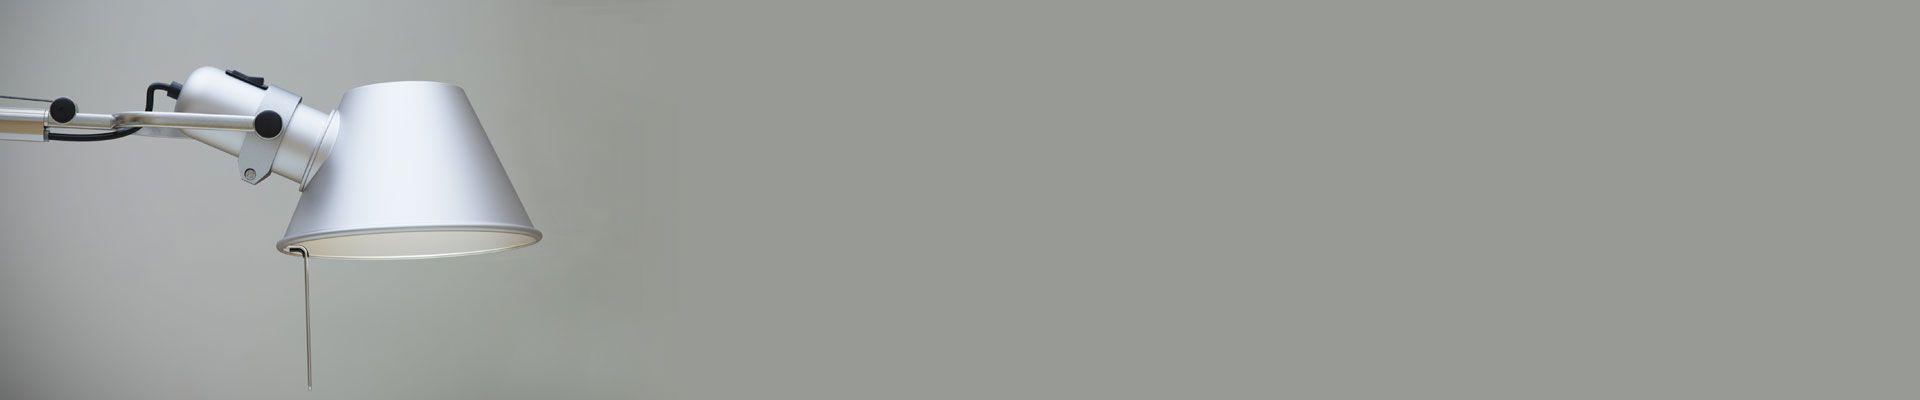 Artemide Tolomeo Lettura